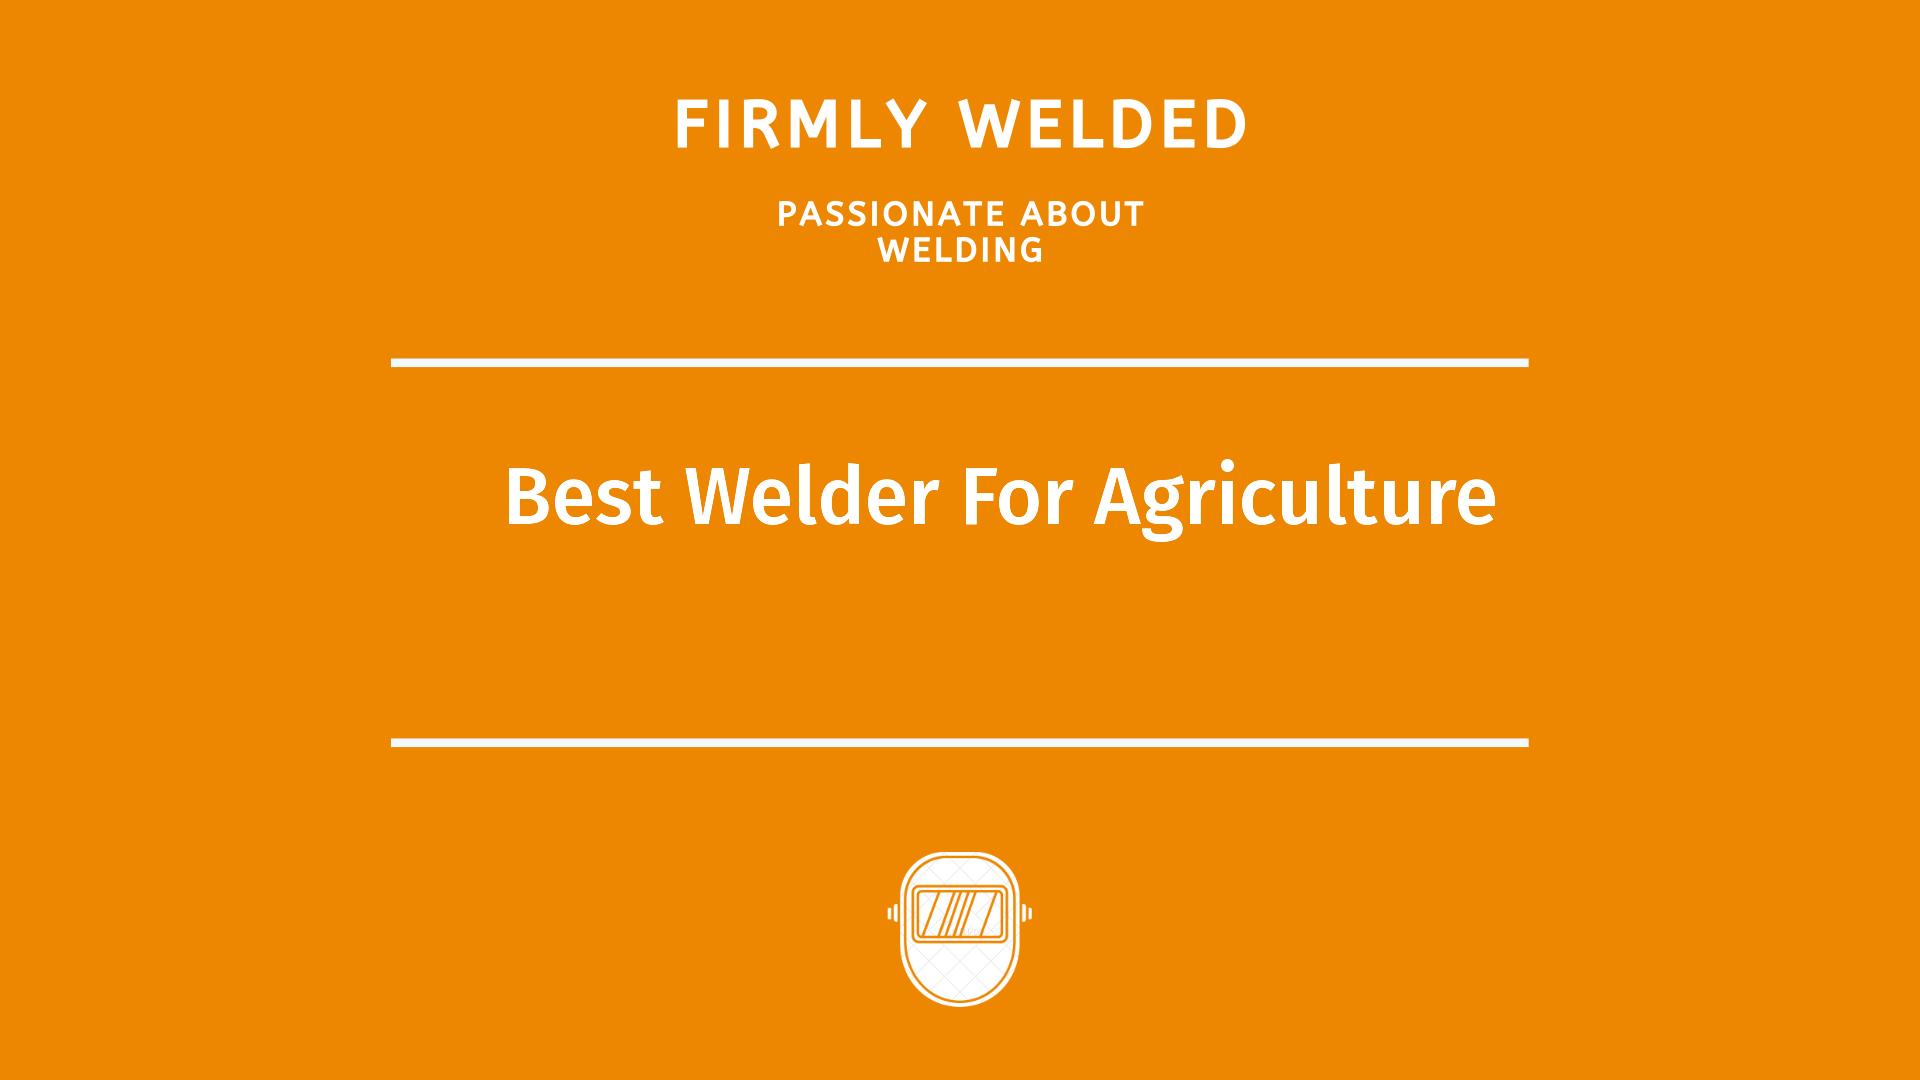 Best Welder For Agriculture